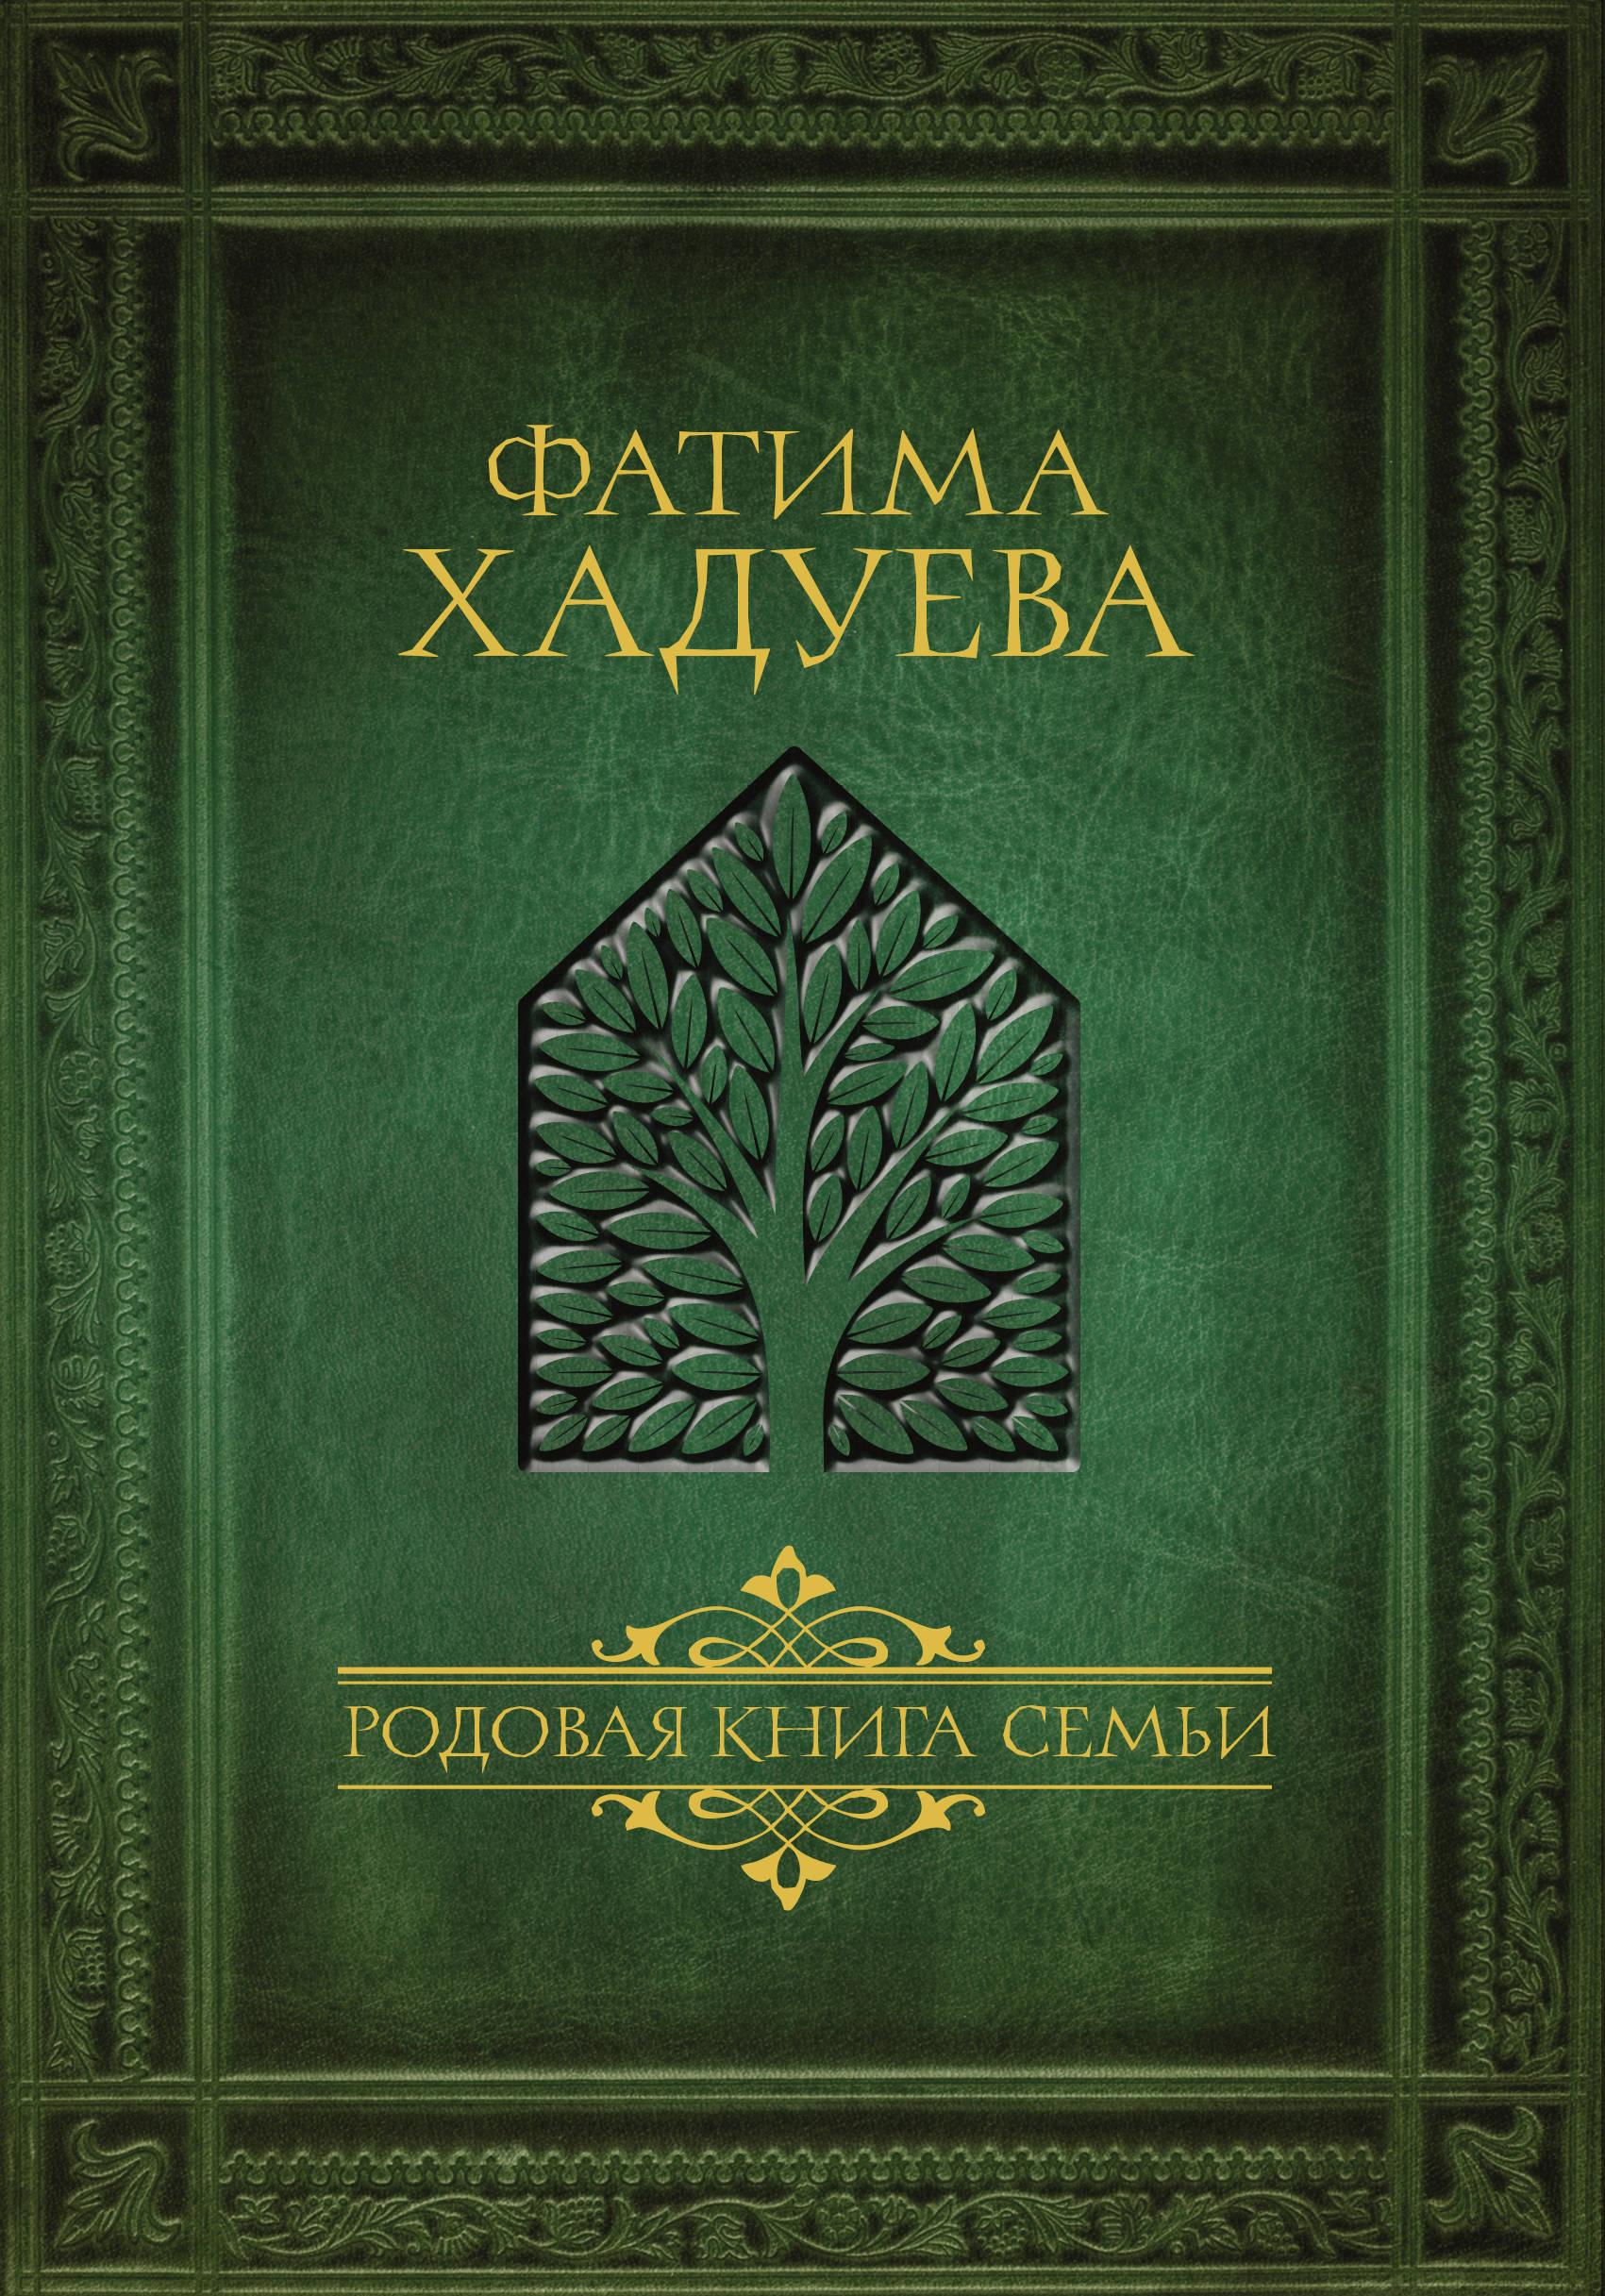 Родовая книга семьи. Хадуева Фатима Магомедовна